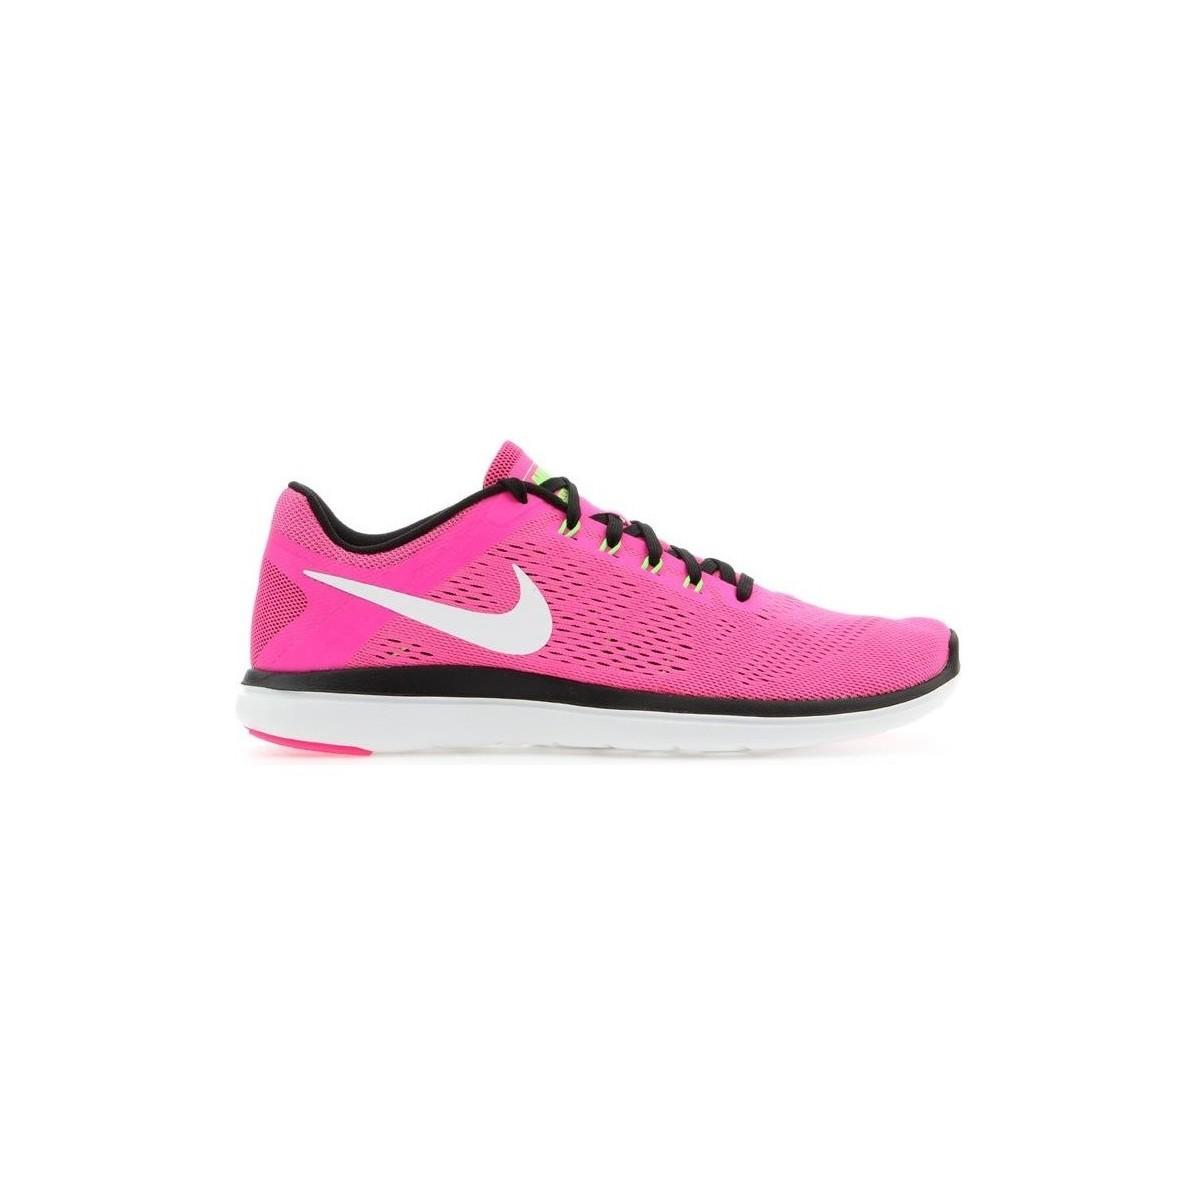 c62f5ec503f Nike Wmns Flex 2016 Rn 830751-600 Women s Shoes (trainers) In Pink ...